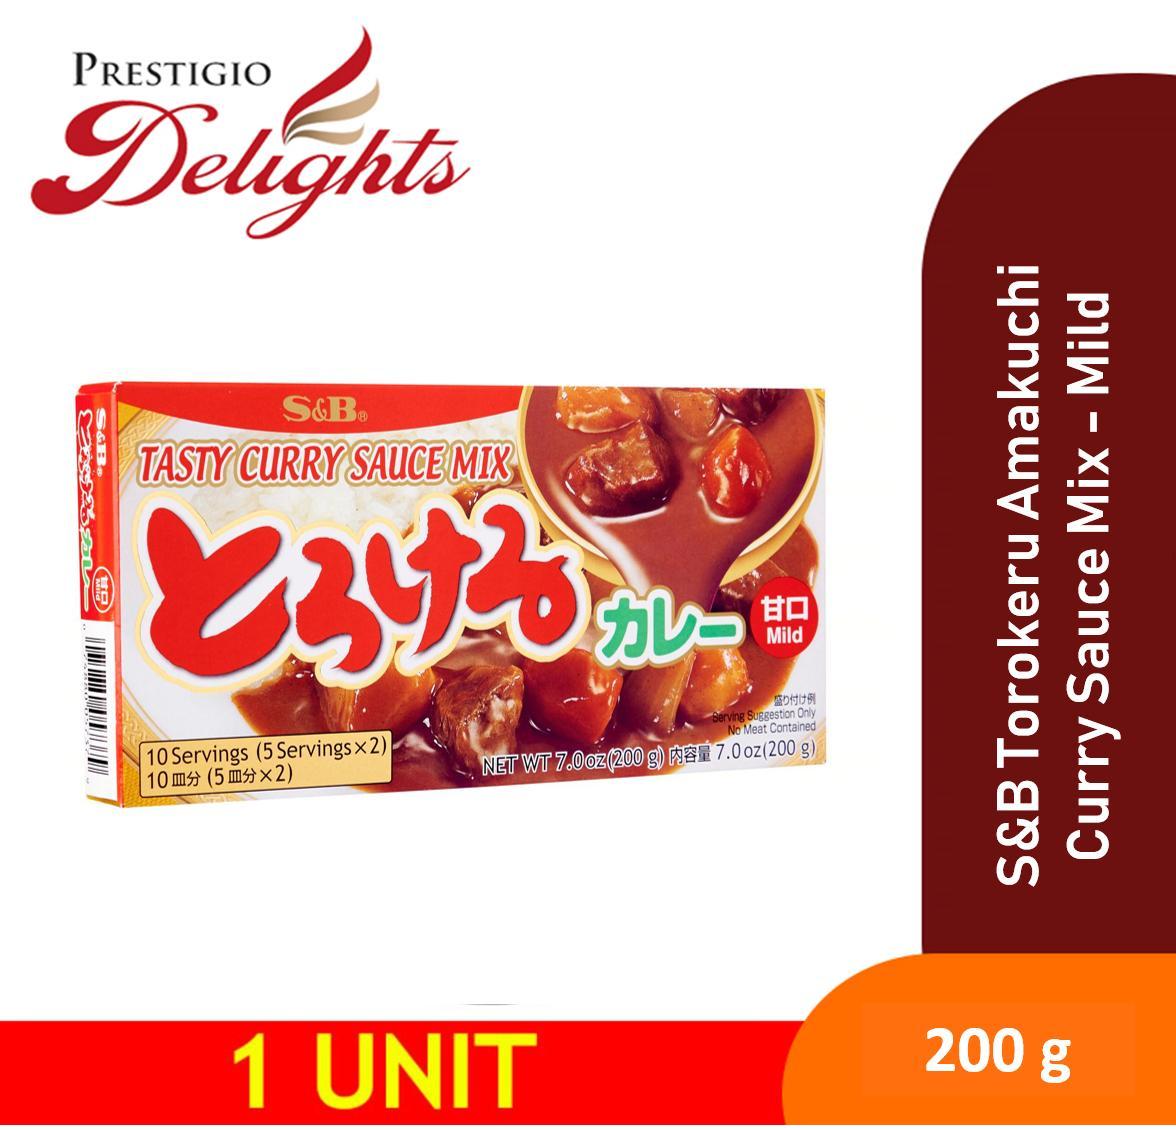 S&b Torokeru Amakuchi Curry Sauce Mix - Mild 200g By Prestigio Delights.